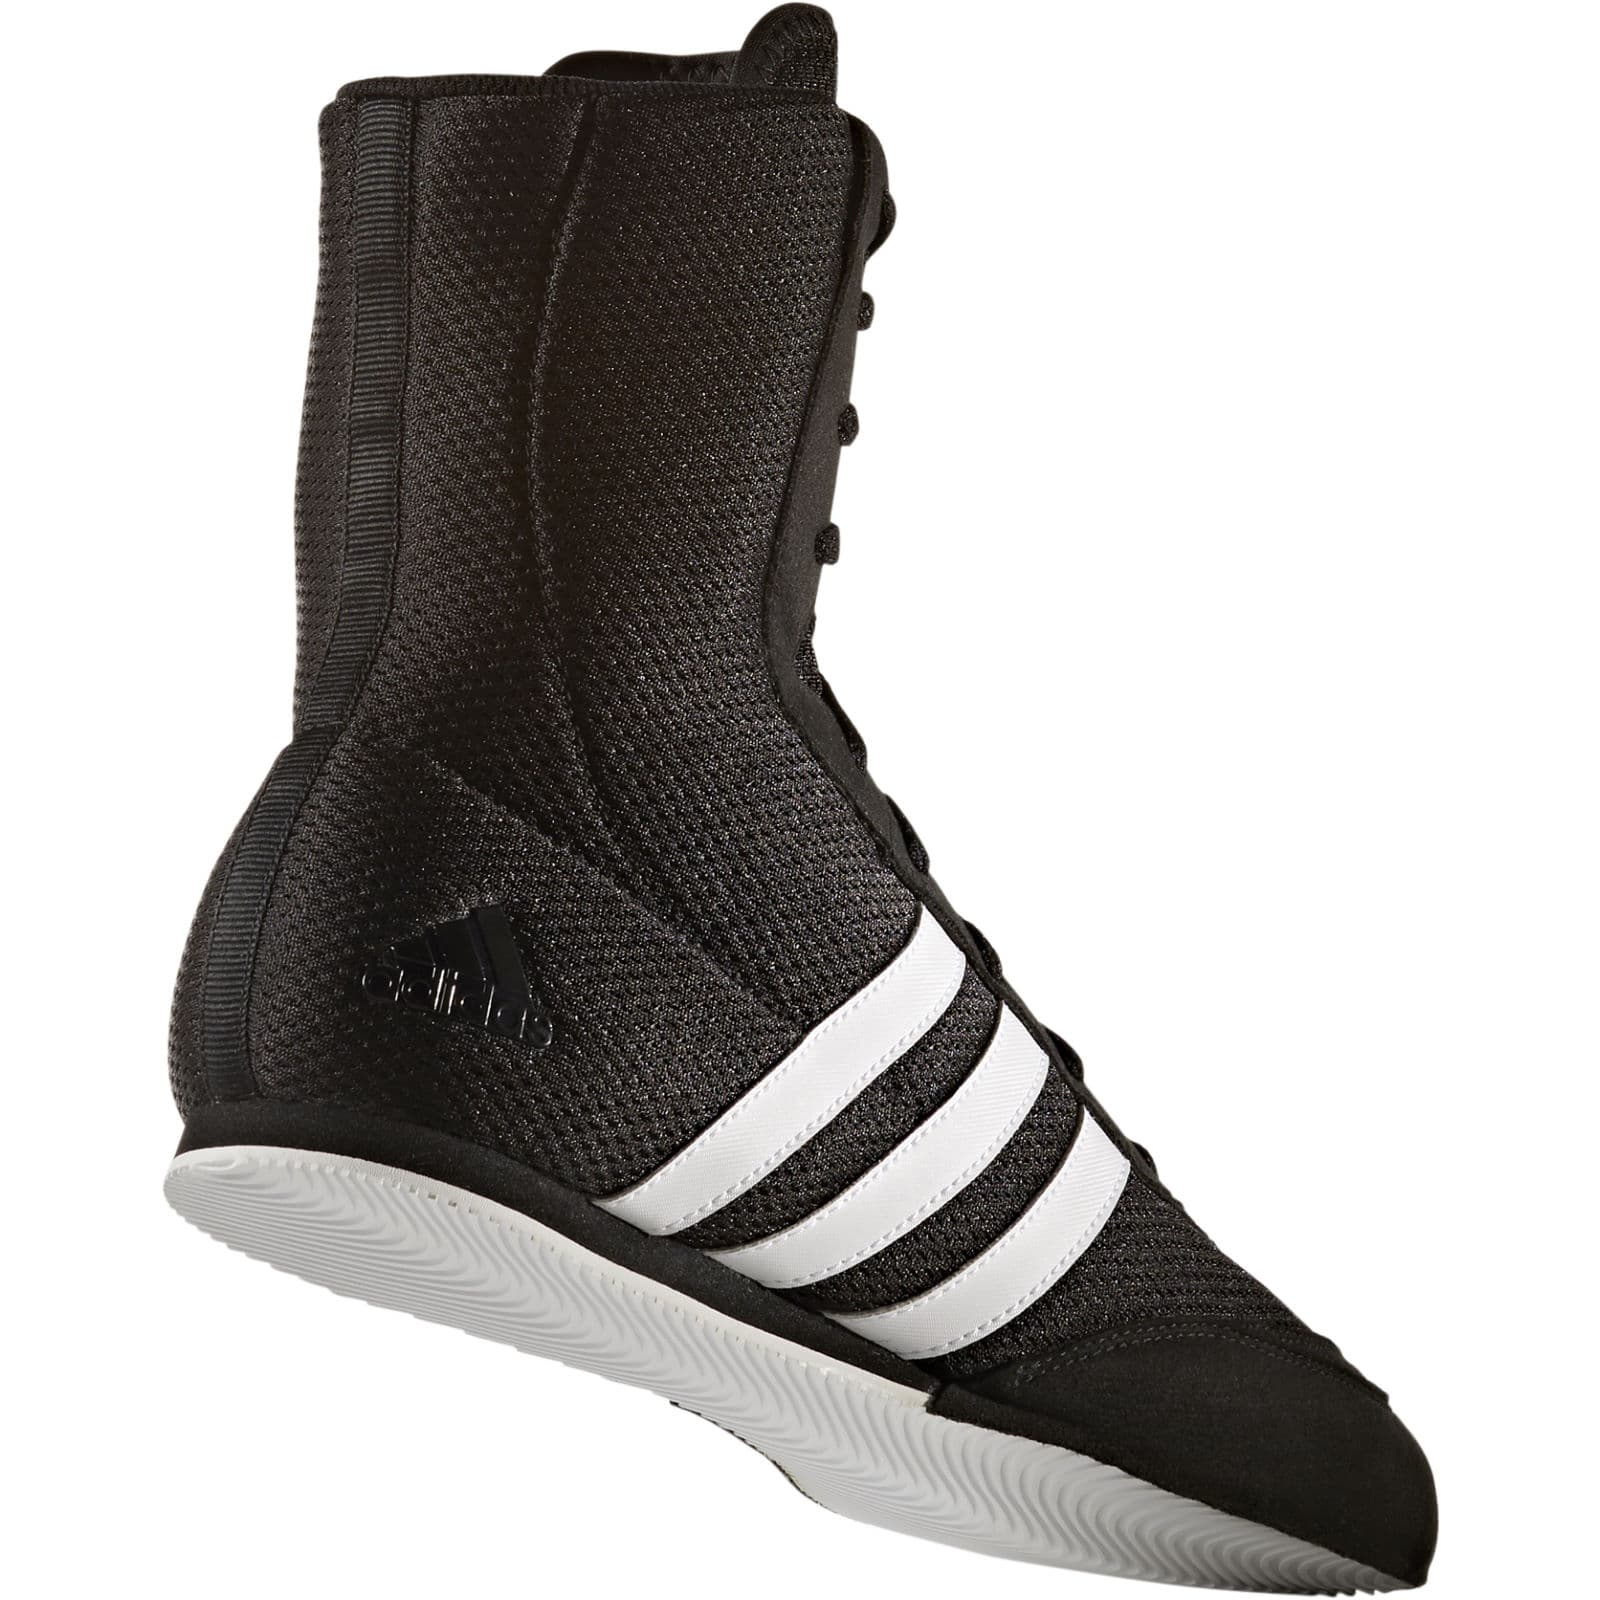 Asia De Chaussures Sport 2 Adidas Hog Quzmpvs Box Boxe BoWCdrex